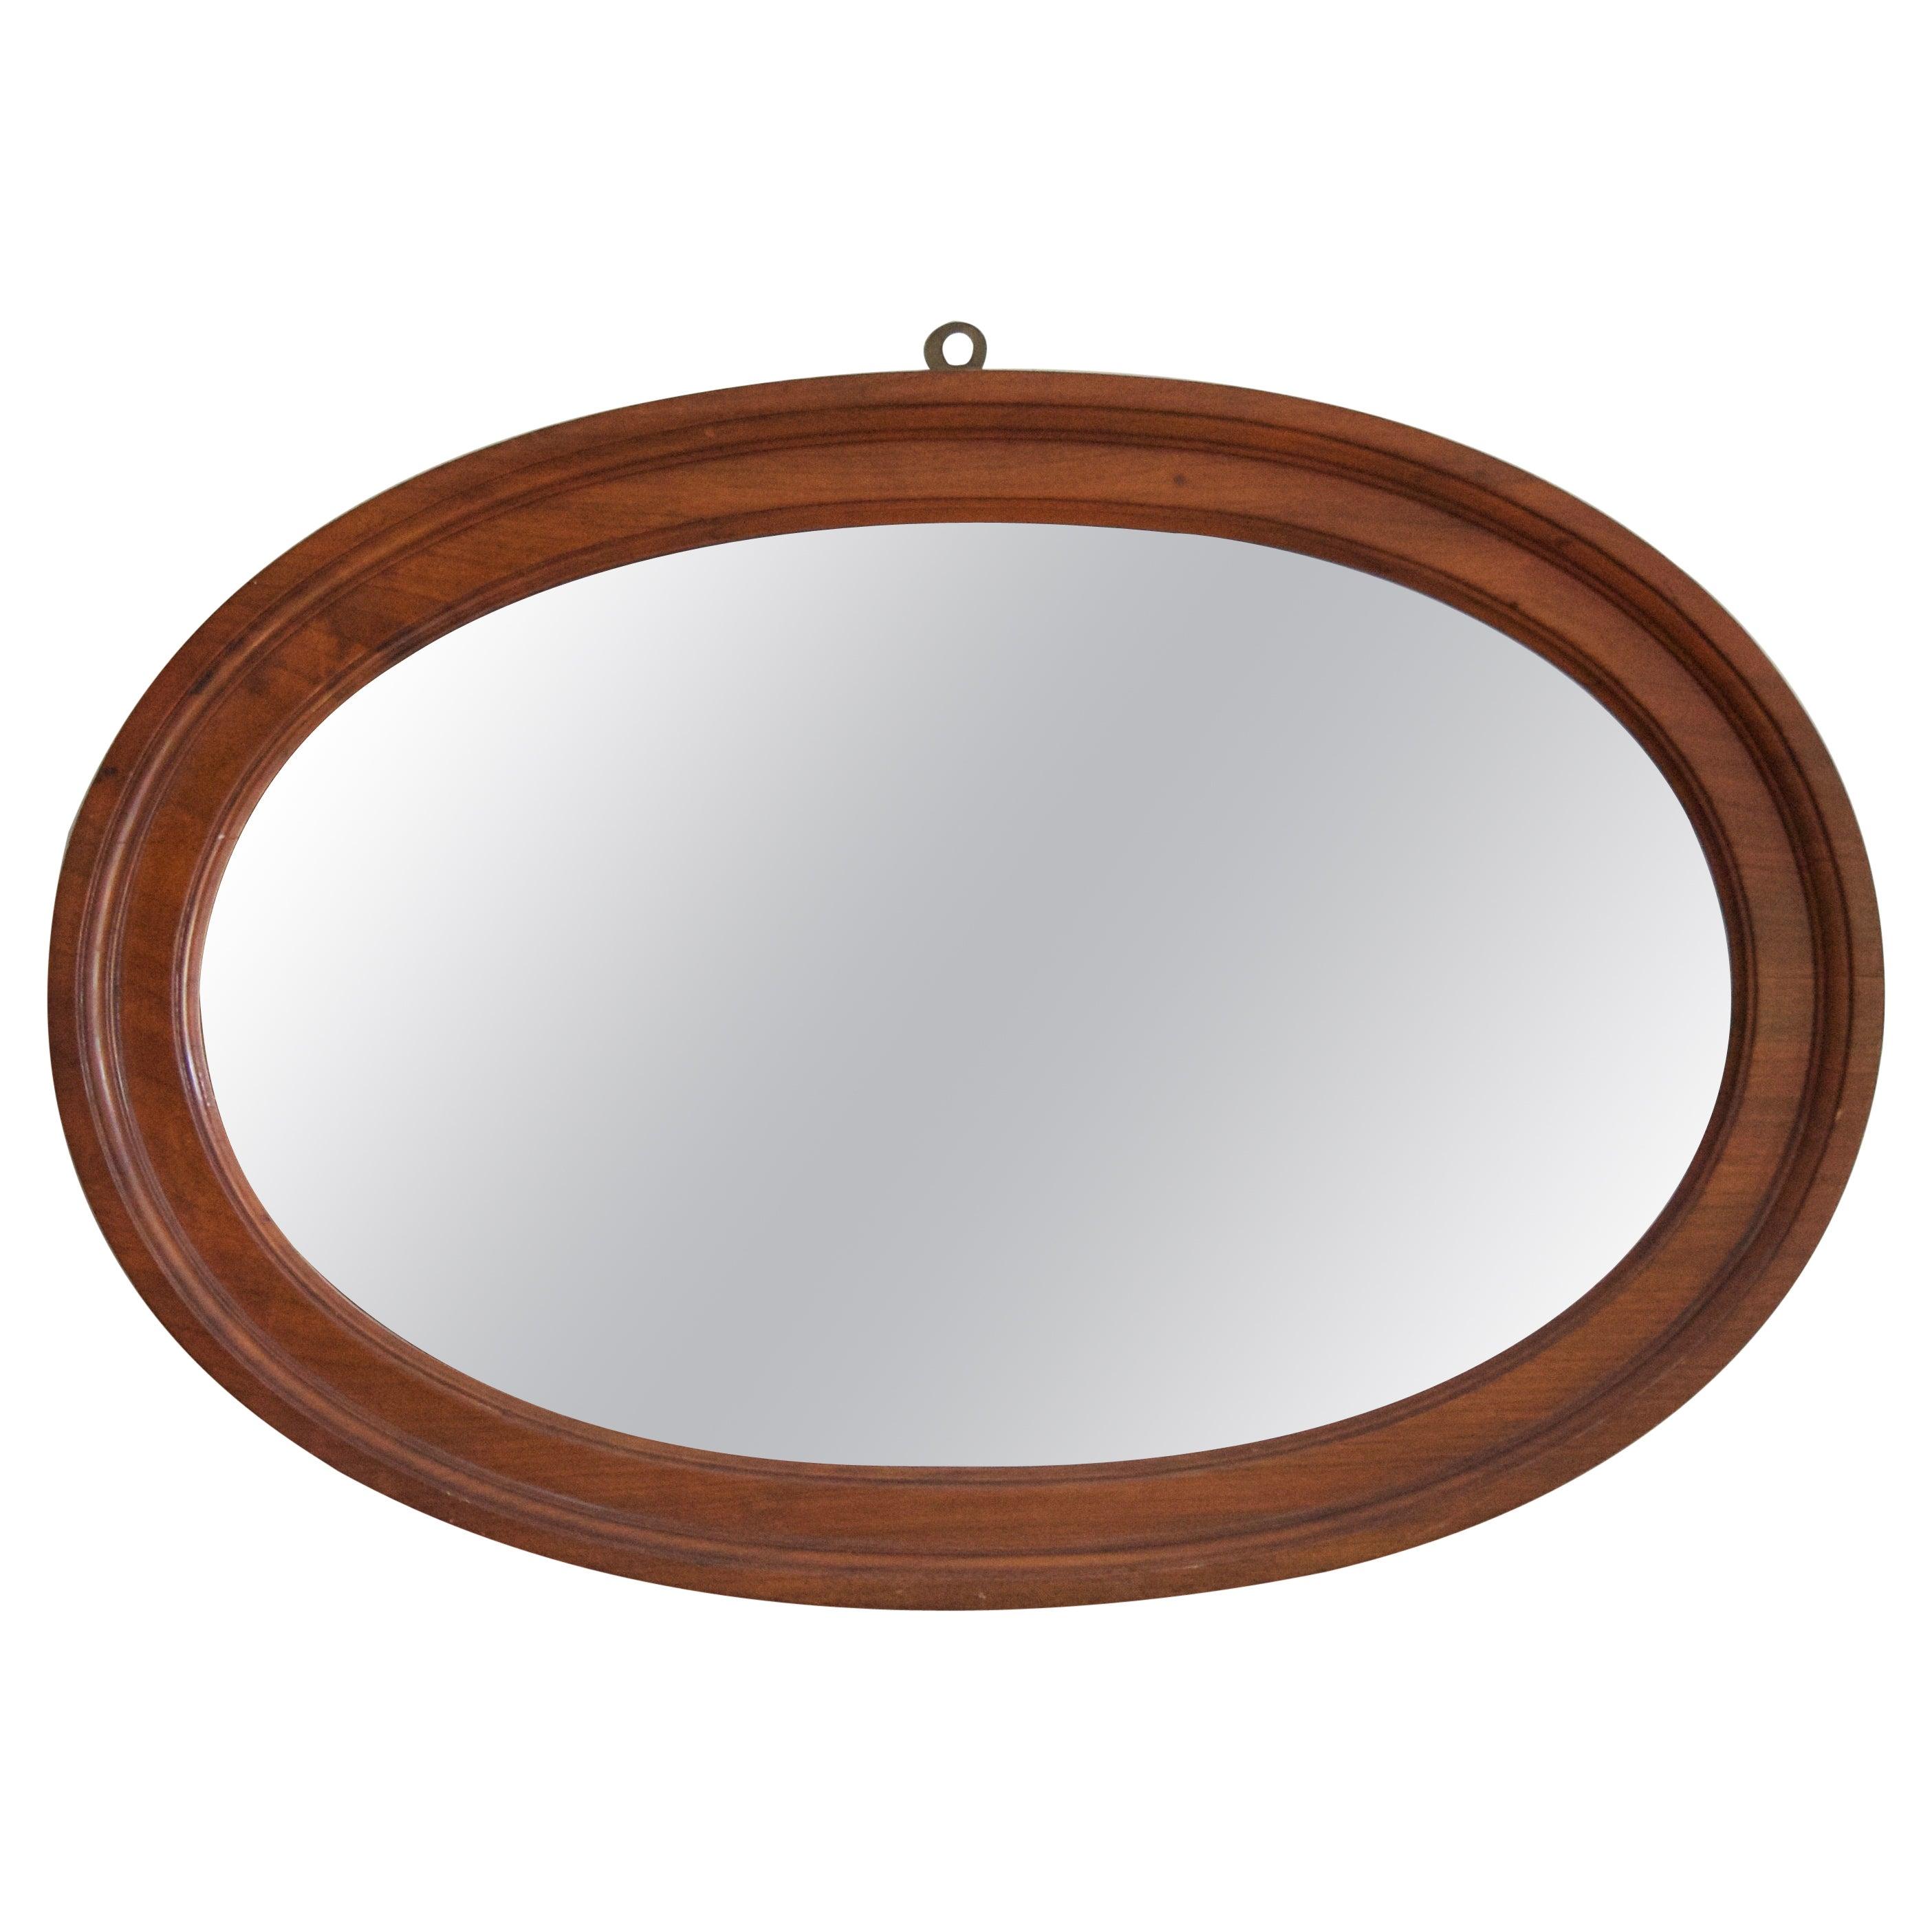 Swedish, Wall Mirror, Walnut, Mirror Glass, Sweden, C. 1930s